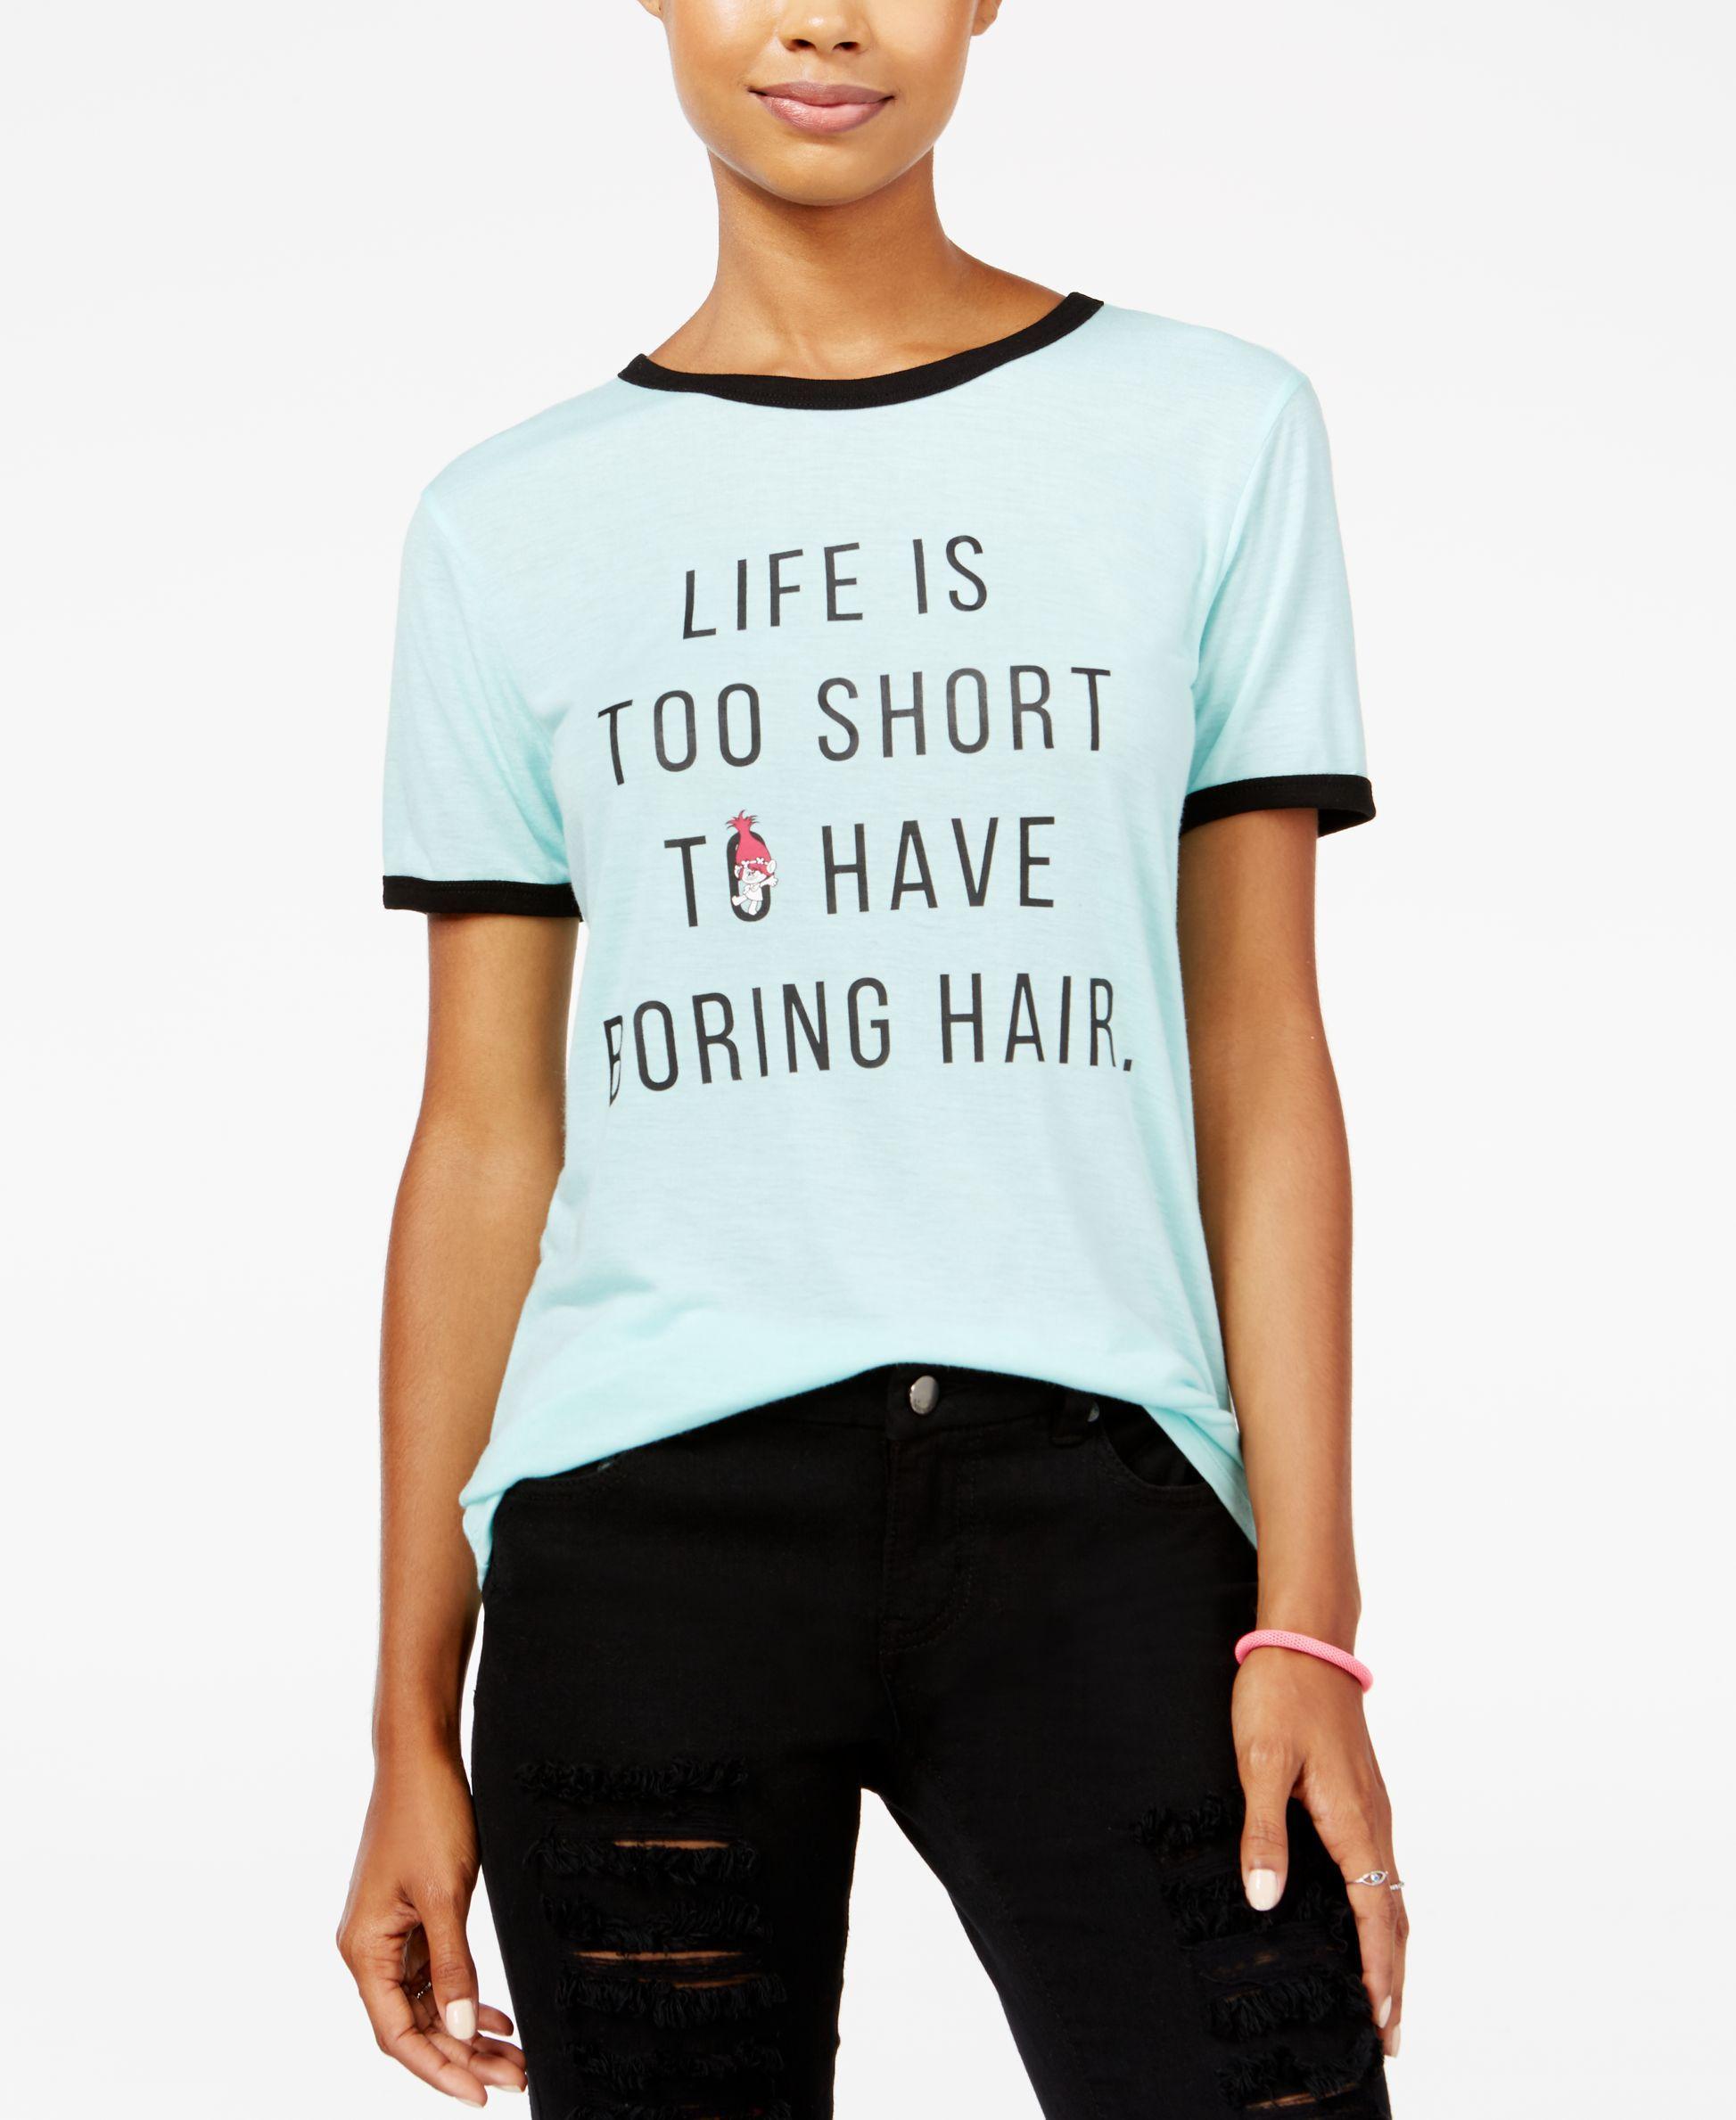 1ac51e0dd Trolls by DreamWorks Juniors' Life Is Too Short Graphic T-Shirt ...